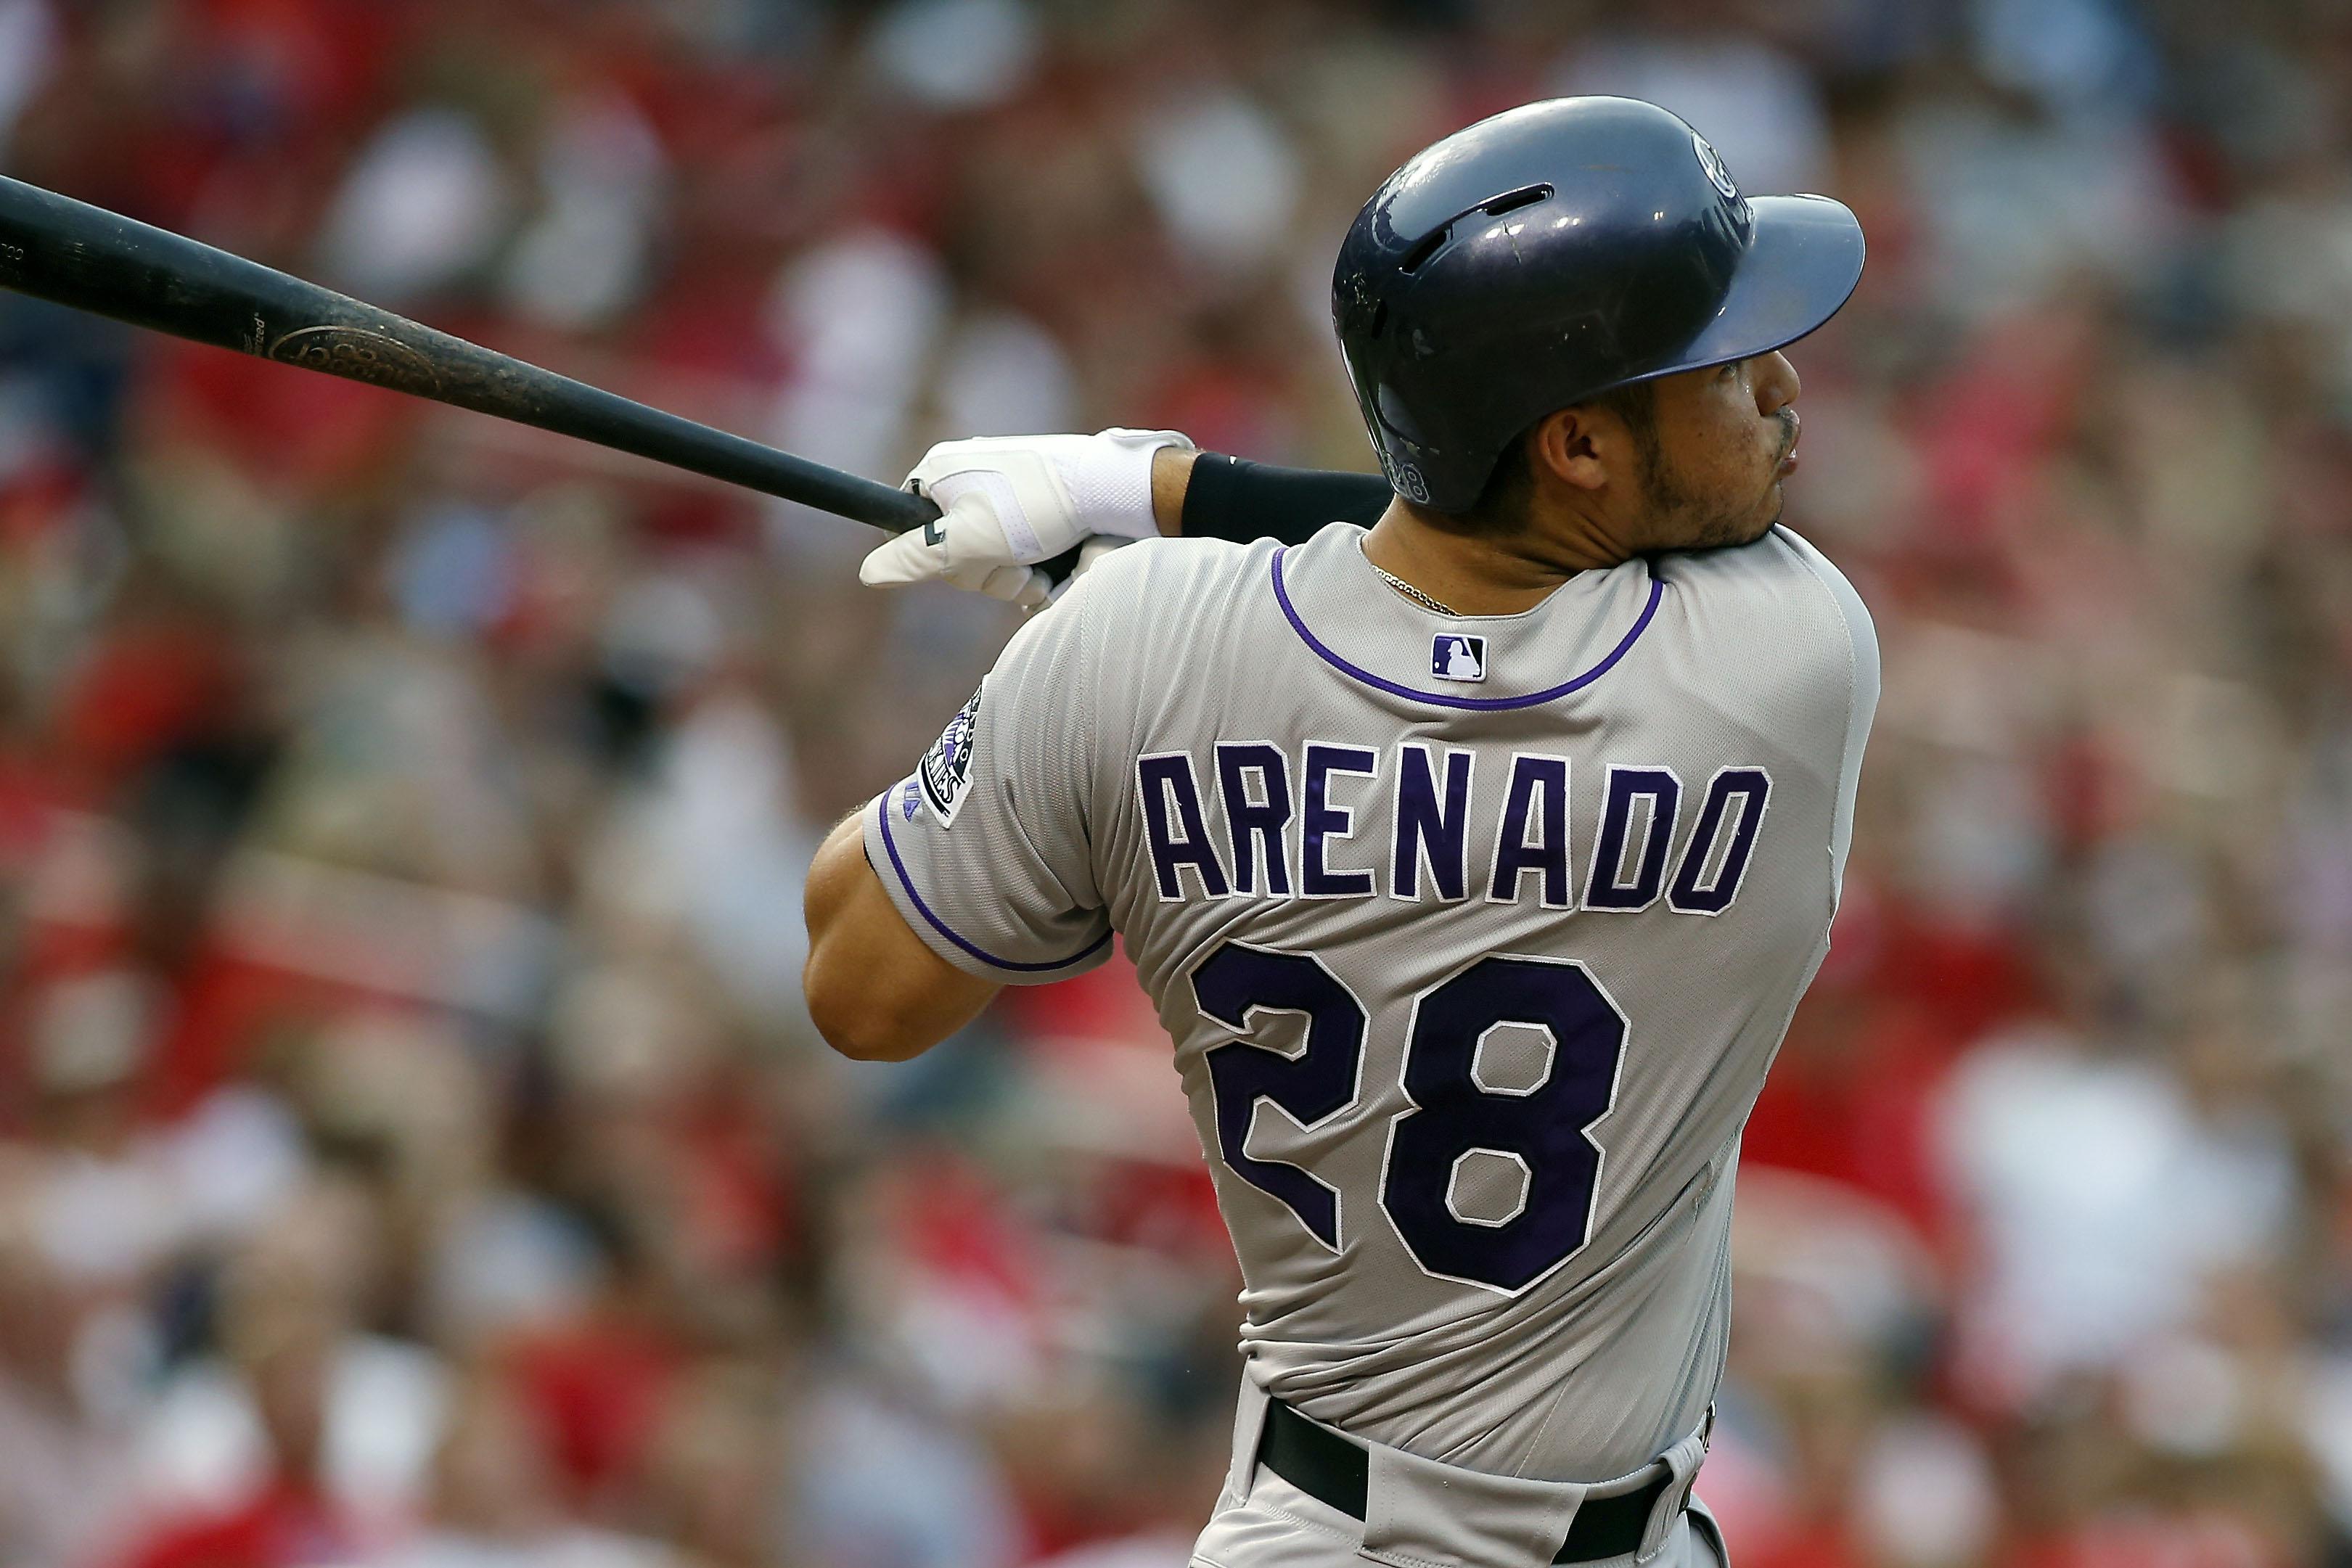 Colorado Rockies' Nolan Arenado follows through on a two run home run during the fourth inning of a baseball game against the St. Louis Cardinals Saturday, Aug. 1, 2015, in St. Louis. (AP Photo/Scott Kane)